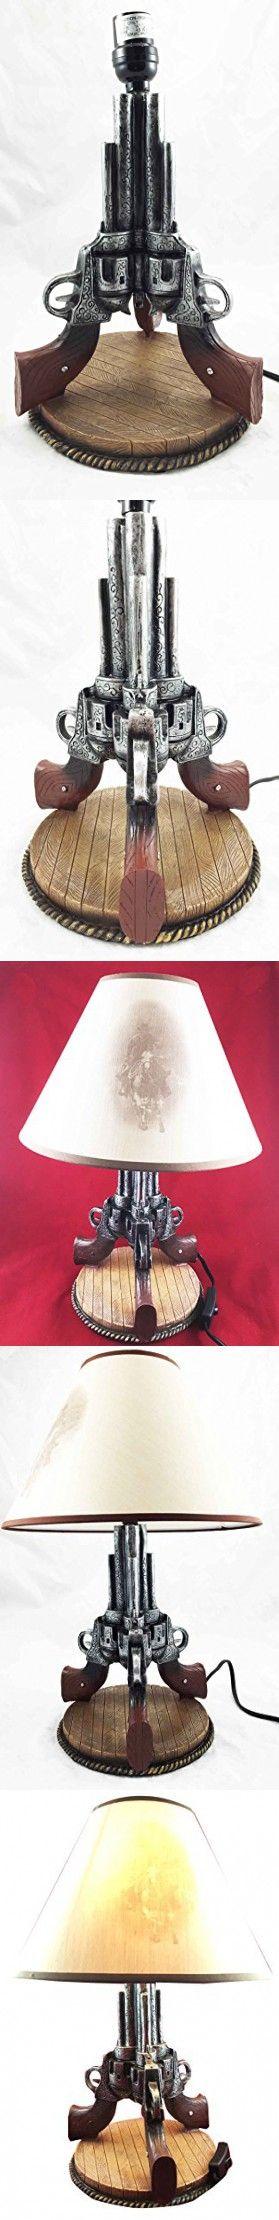 "Triple Beretta Gun Six Shooters 19""H Desktop Table Lamp Cowboy Western Home Decor"